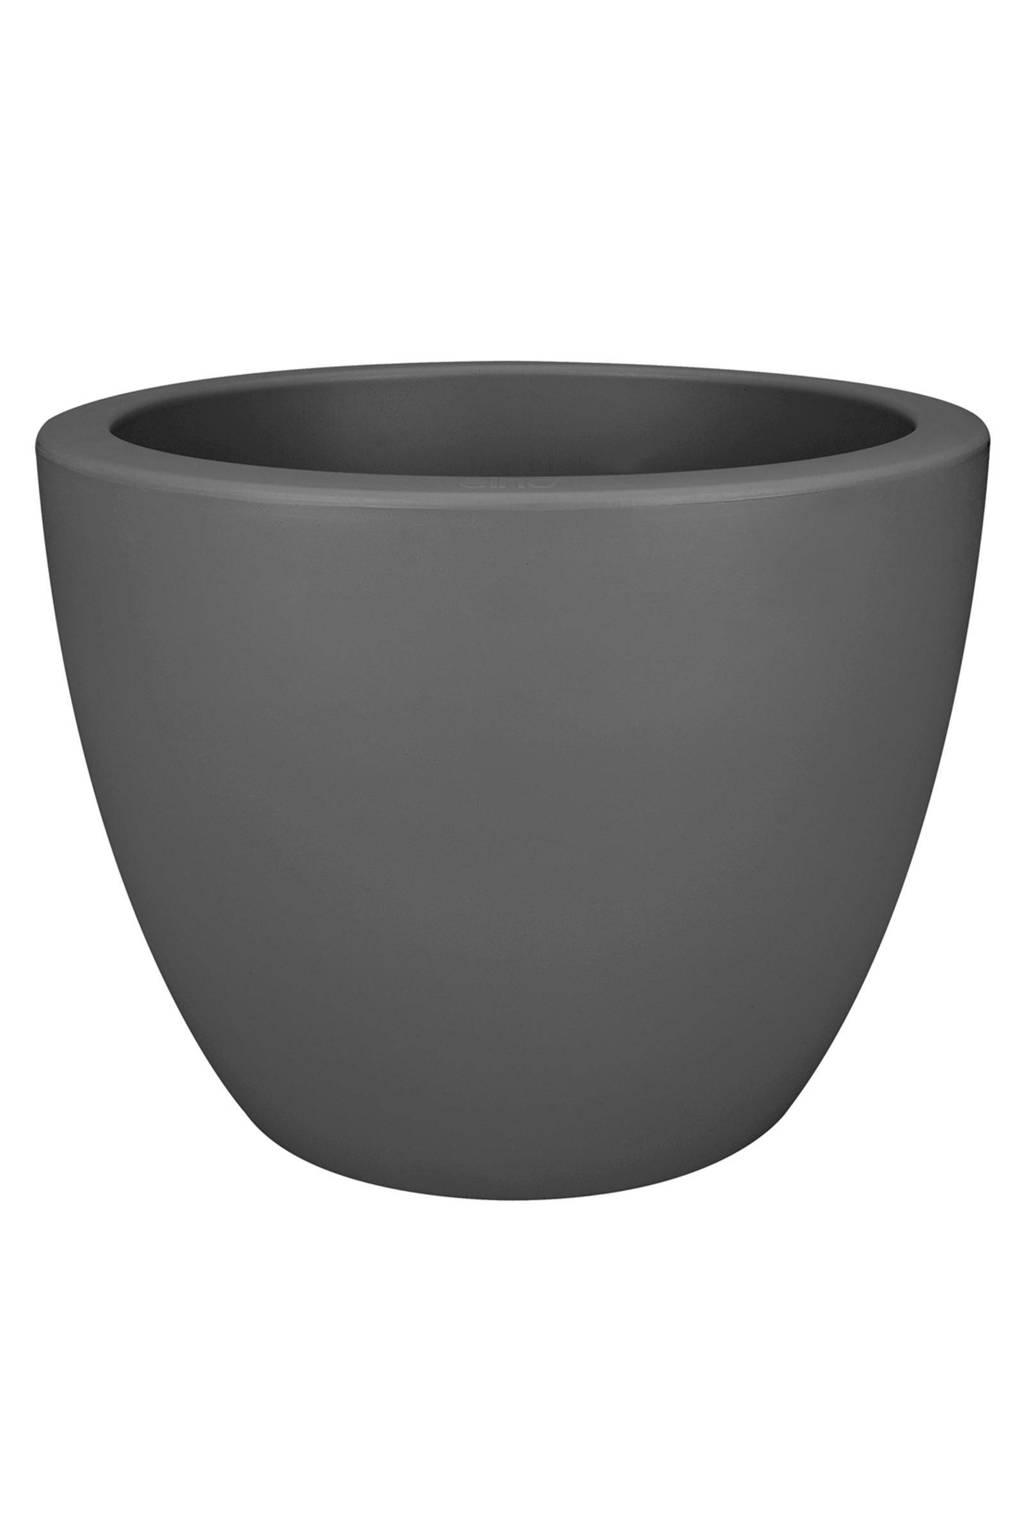 Elho bloempot Pure soft round (40ø cm), Antraciet